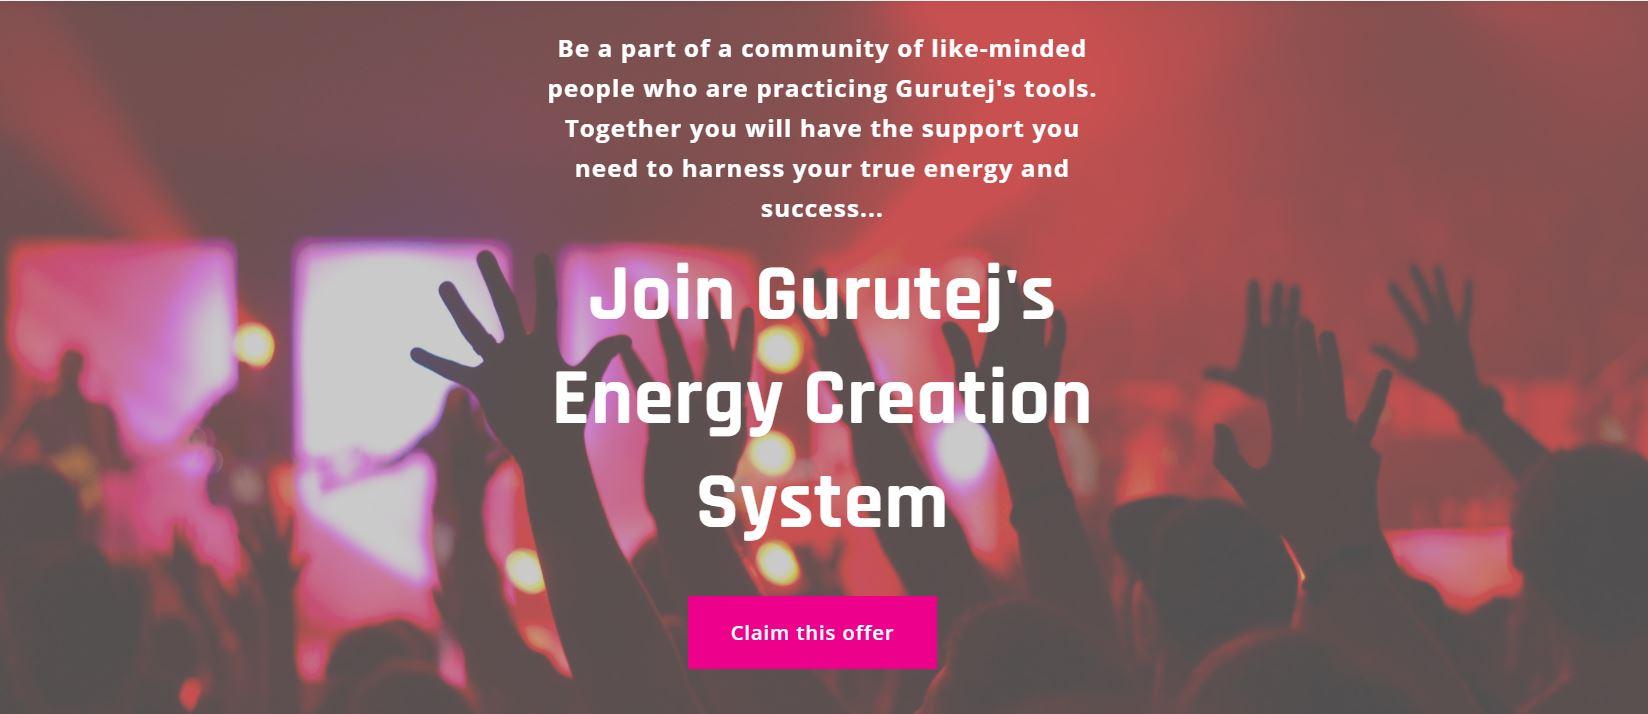 Energy Creation Systems | Kundalini Yoga Los Angeles | Gurutej